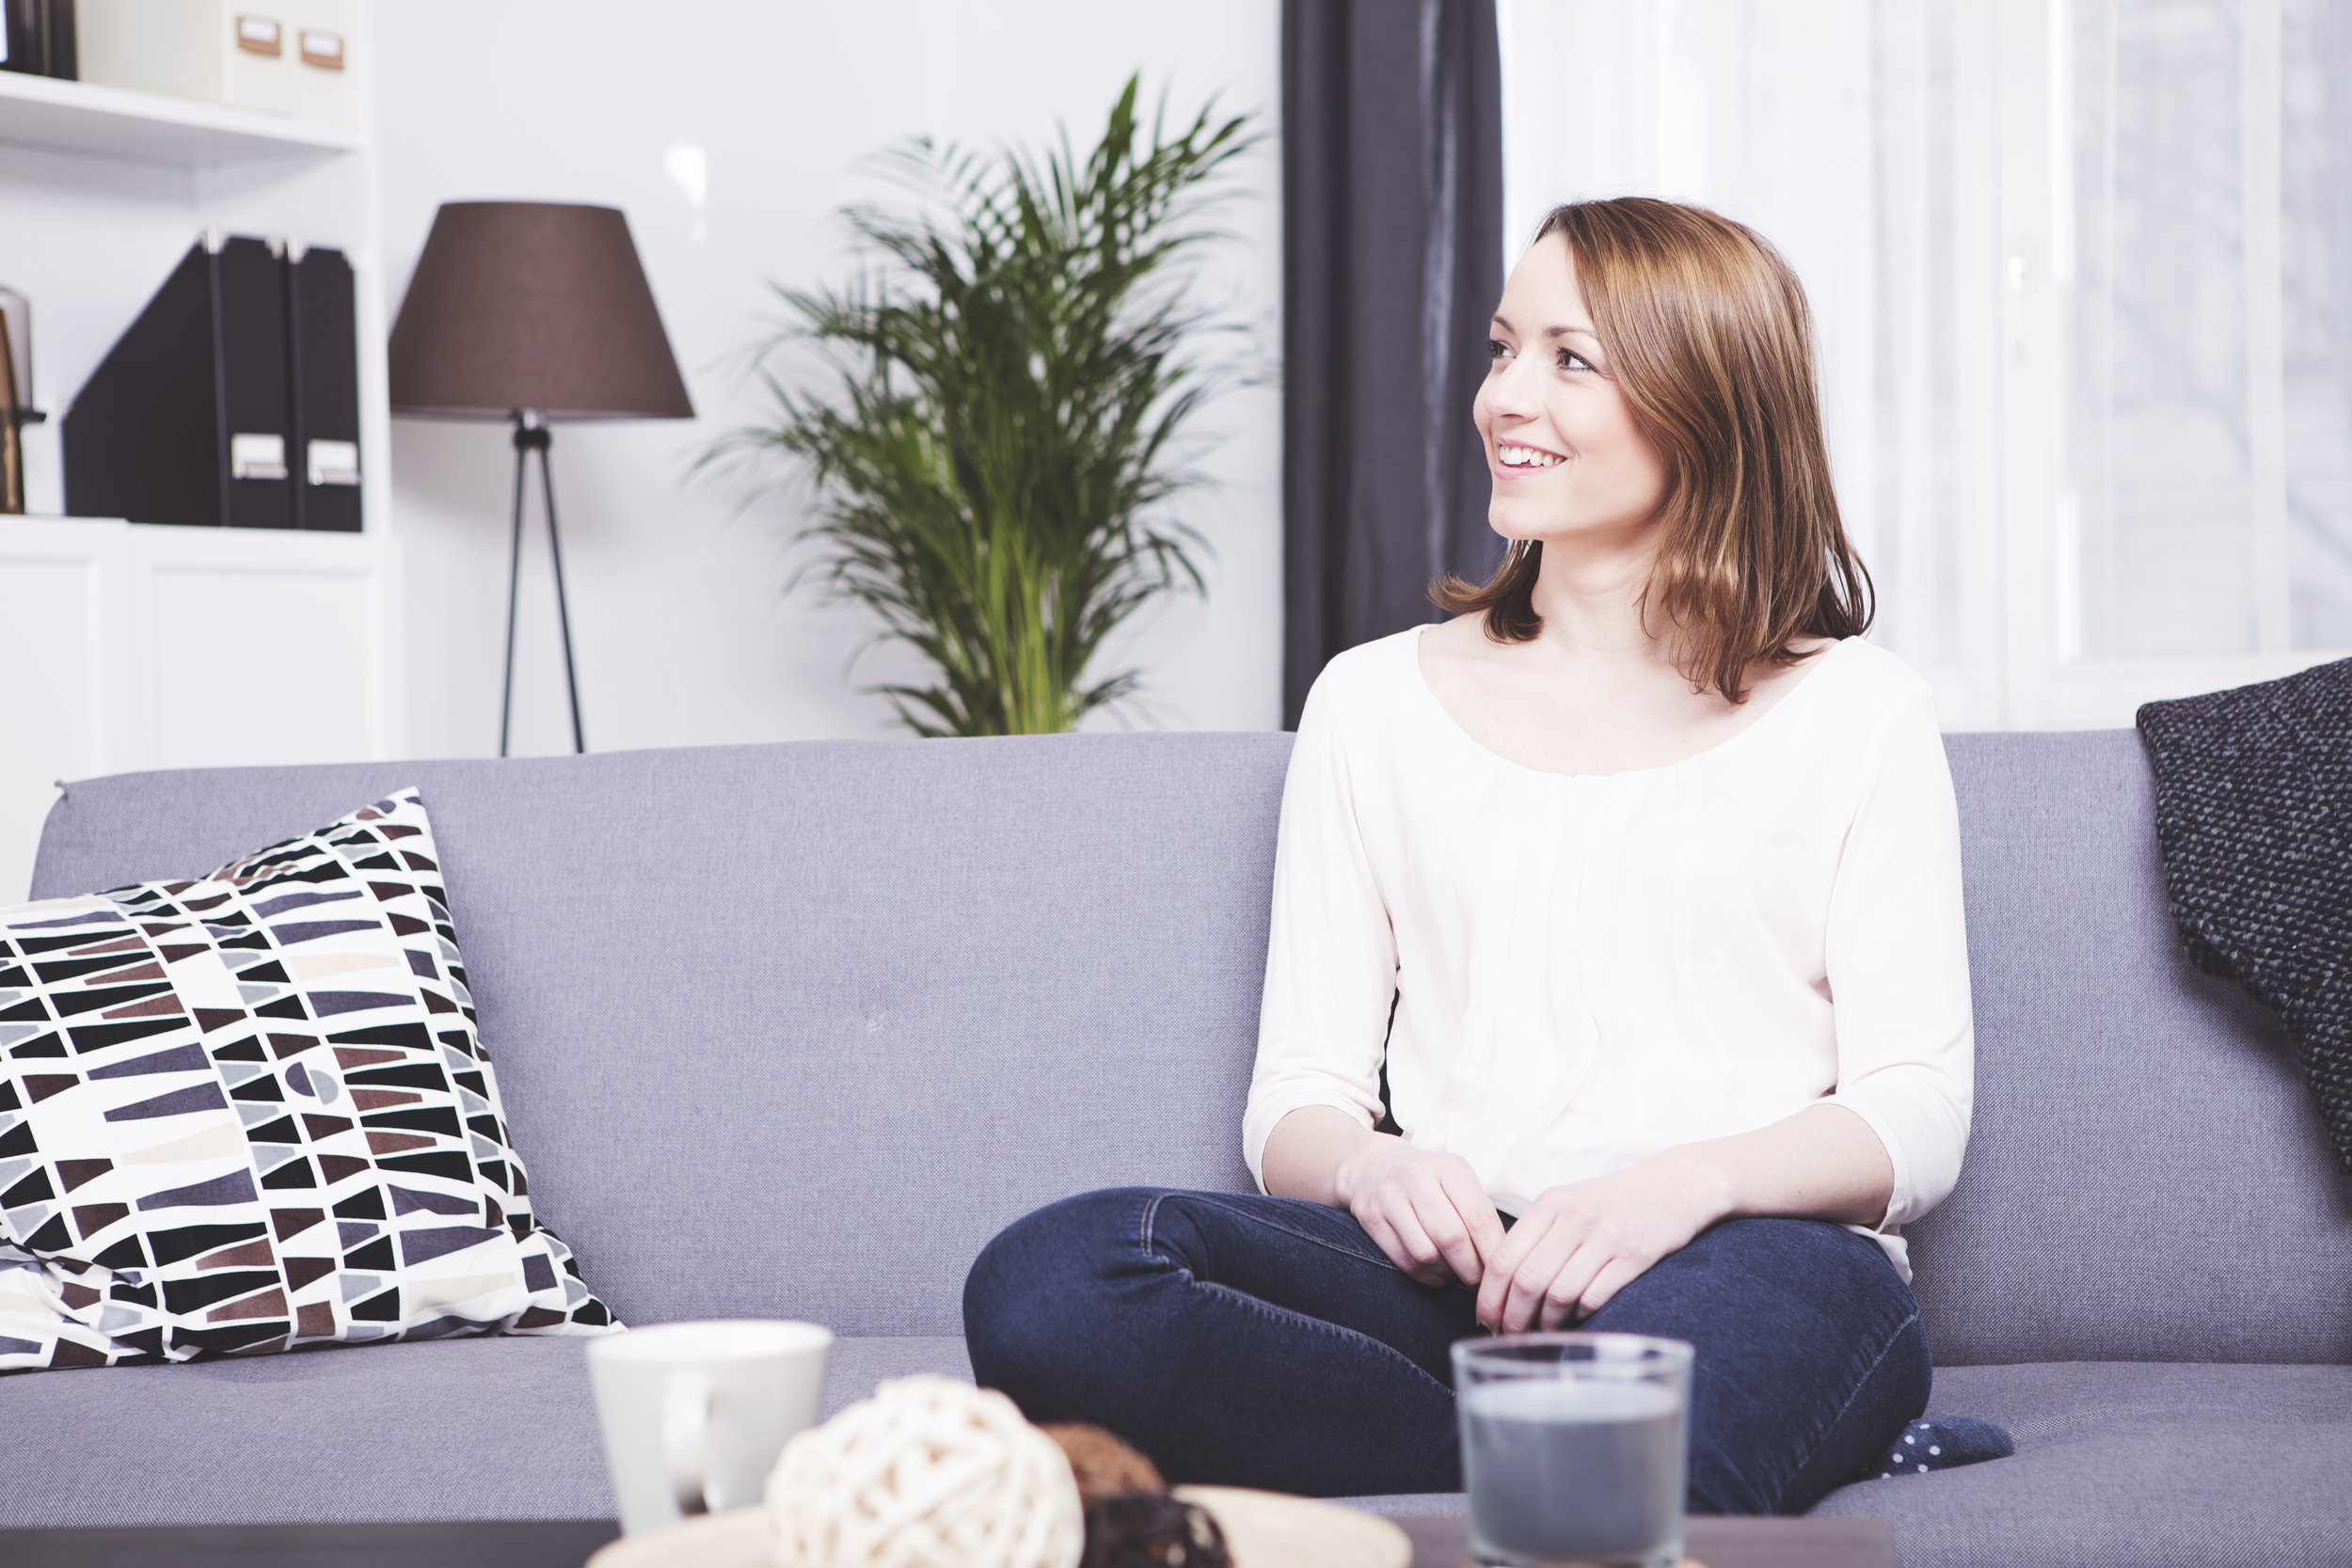 Nola Speaks Public Speaking Mentorship, interview coaching, speech mentoring one-on-one